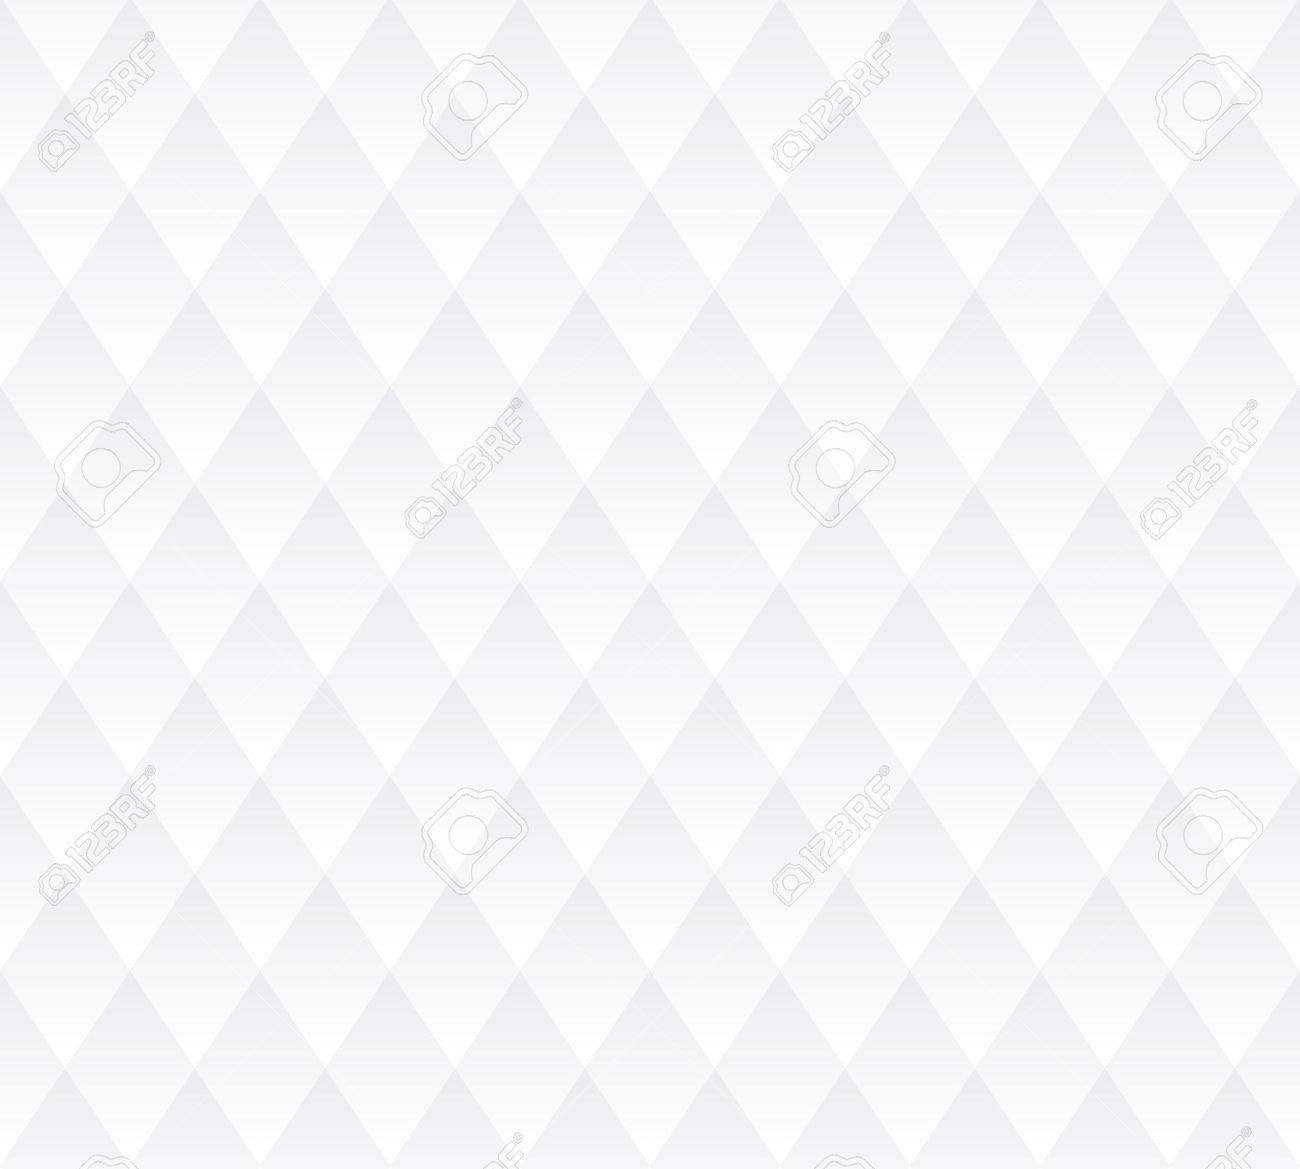 Maimoon 白背景幾何学